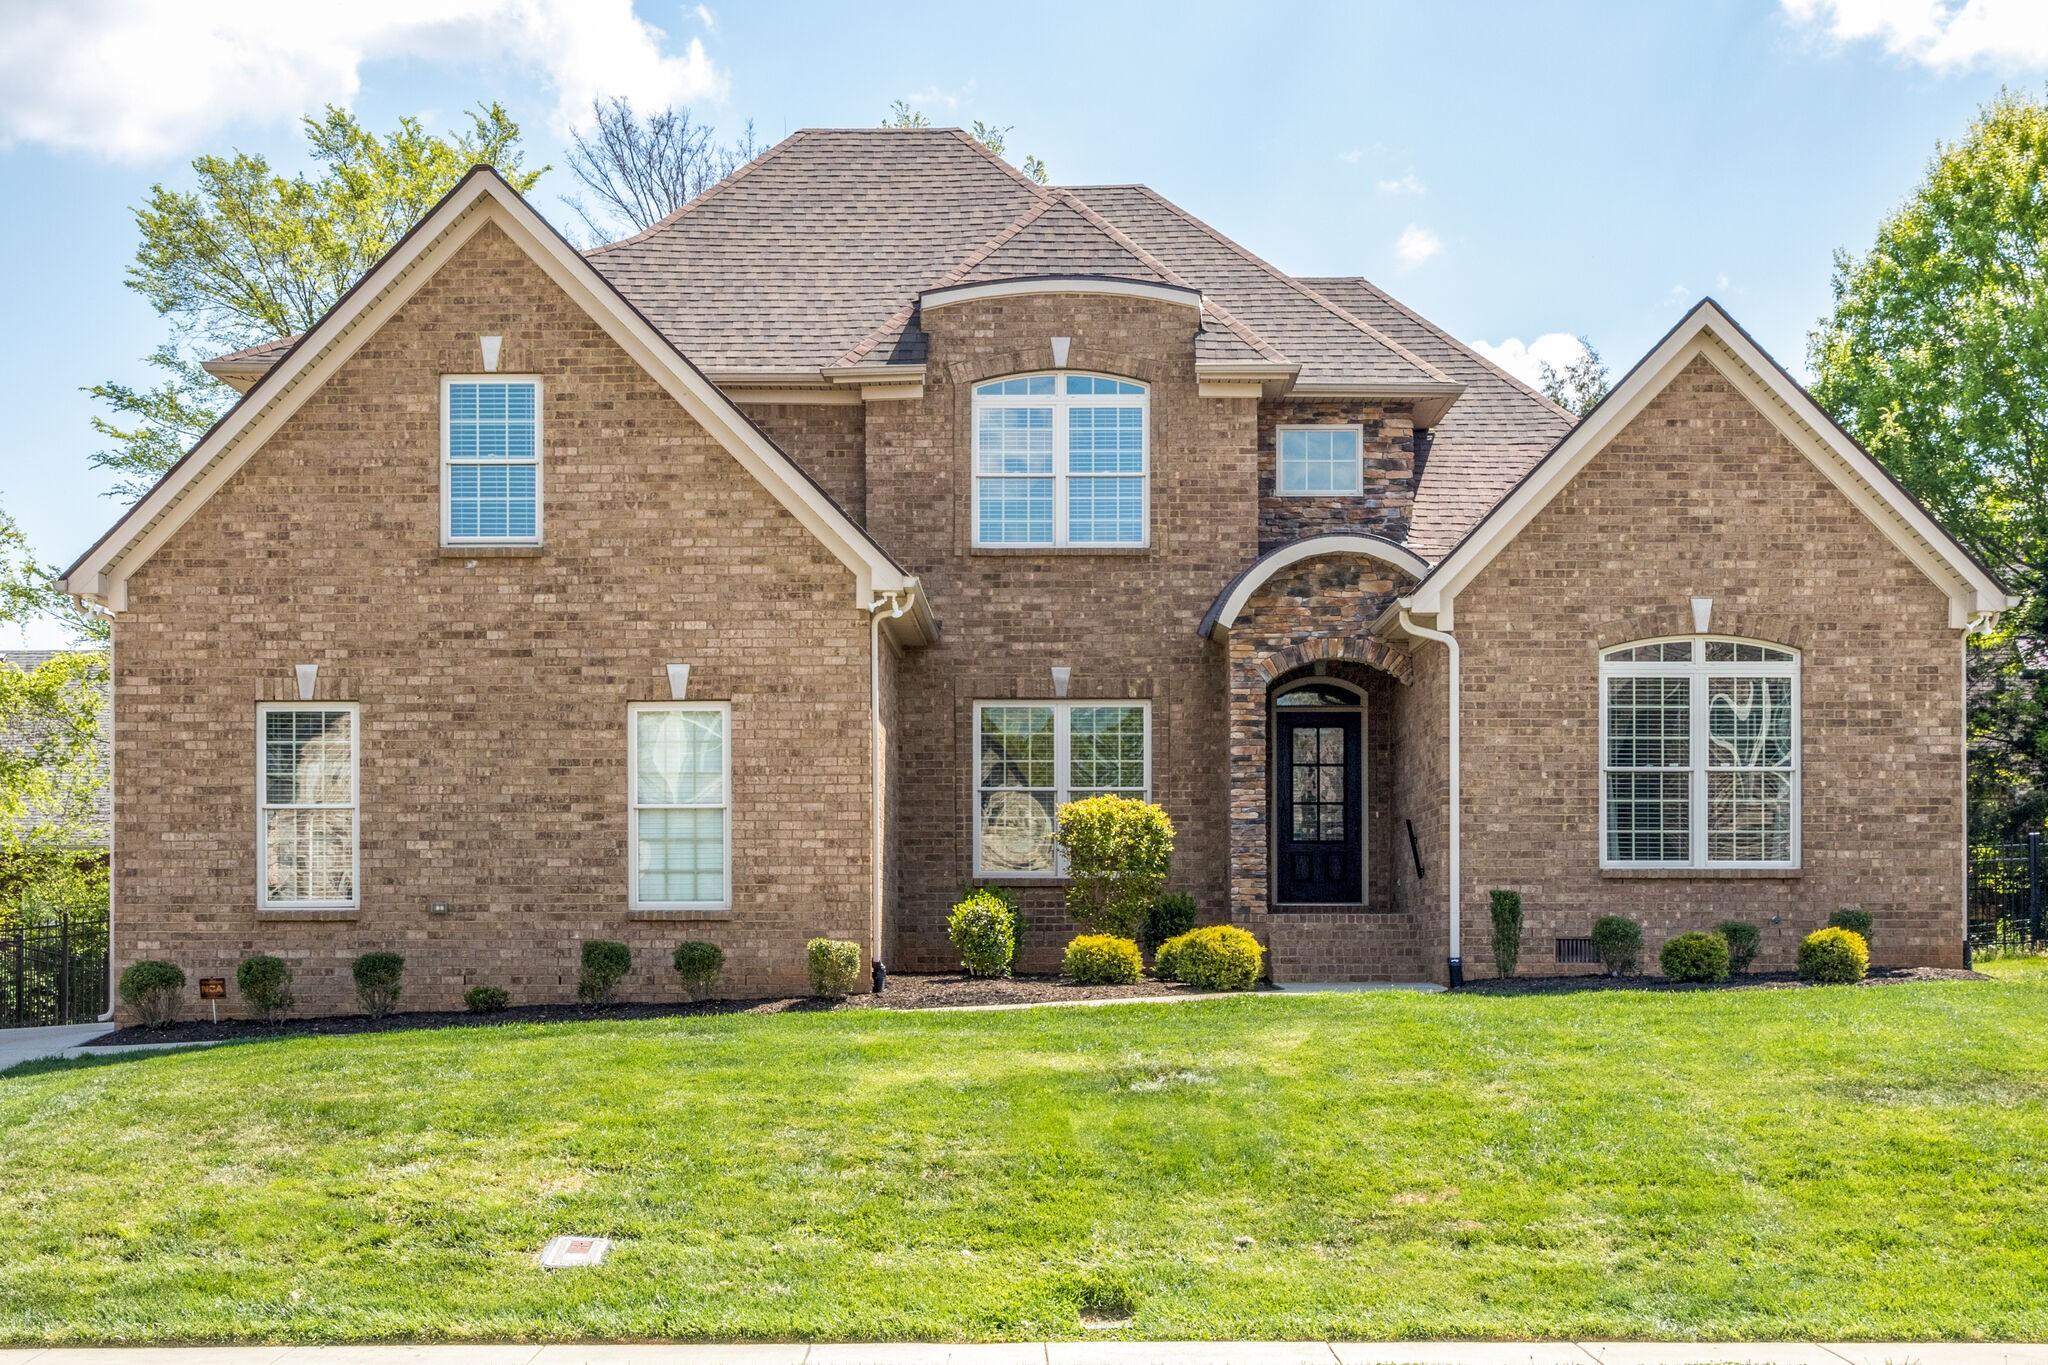 4422 Garcia Blvd Property Photo - Murfreesboro, TN real estate listing